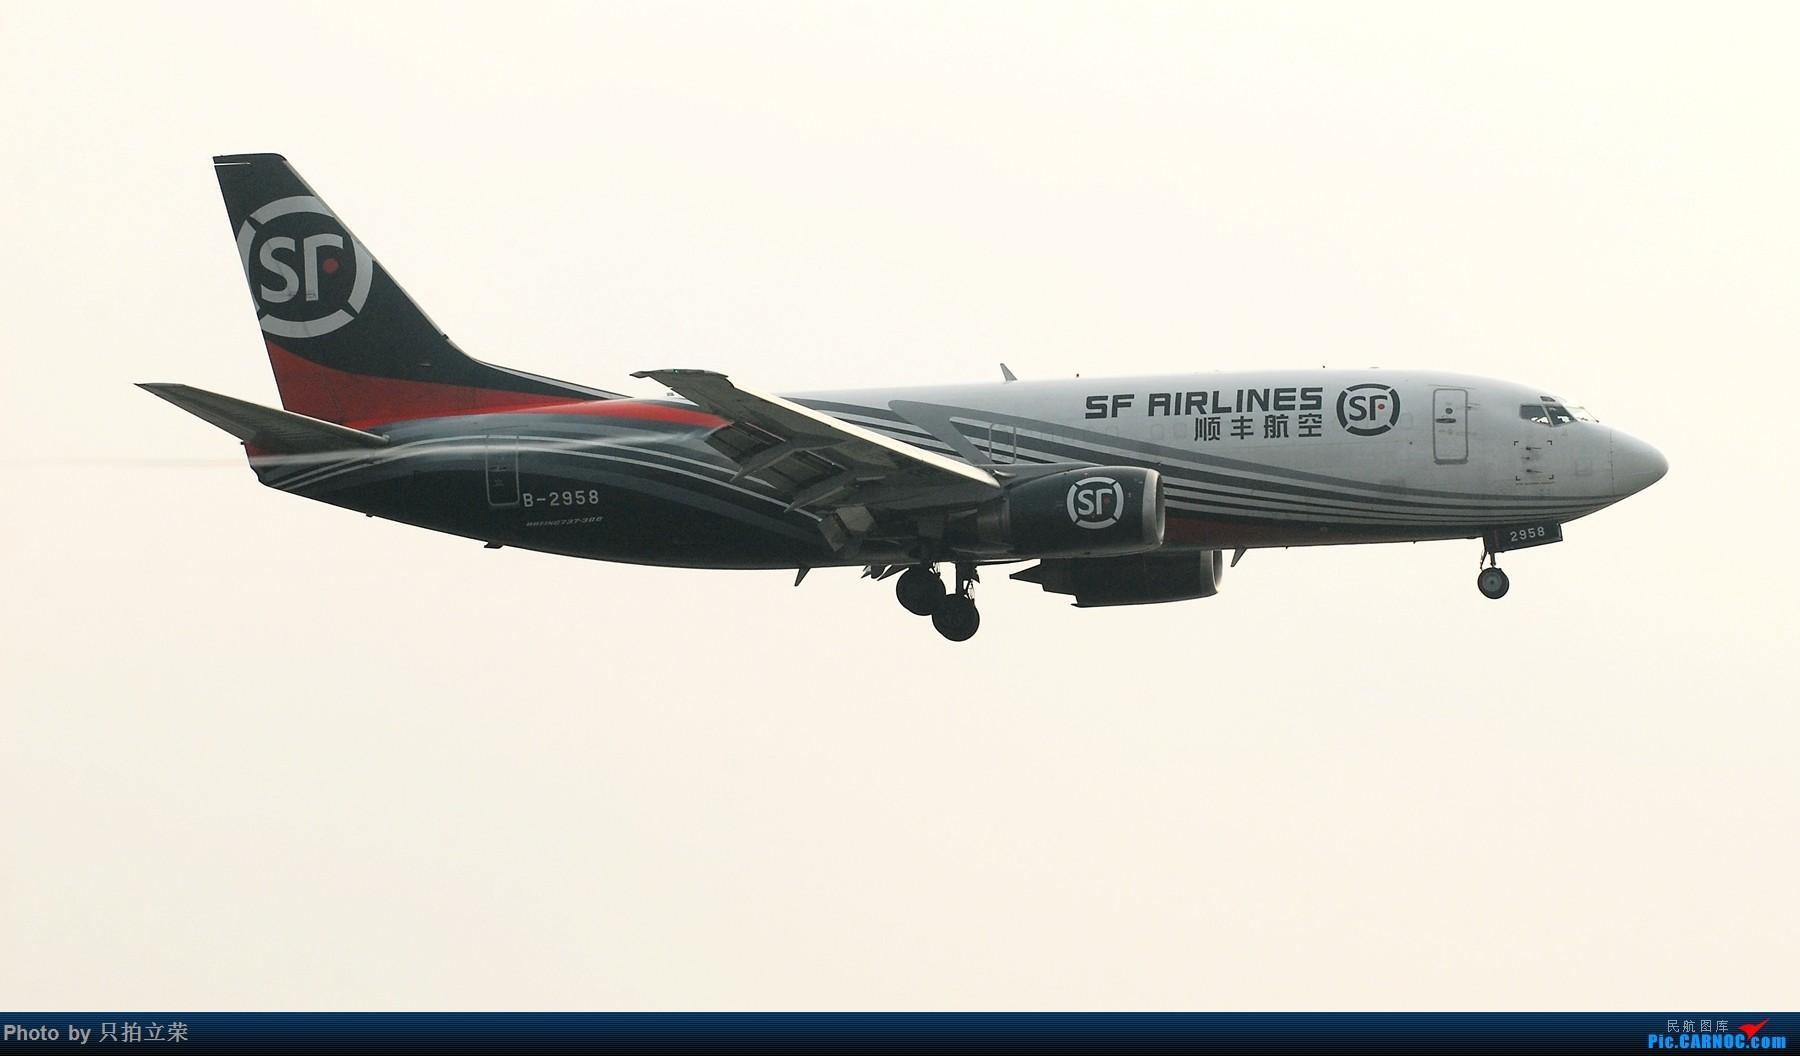 Re:[原创]湖南飞友会之,阿娇终于来长沙! BOEING 737-300 B-2958 中国长沙黄花国际机场